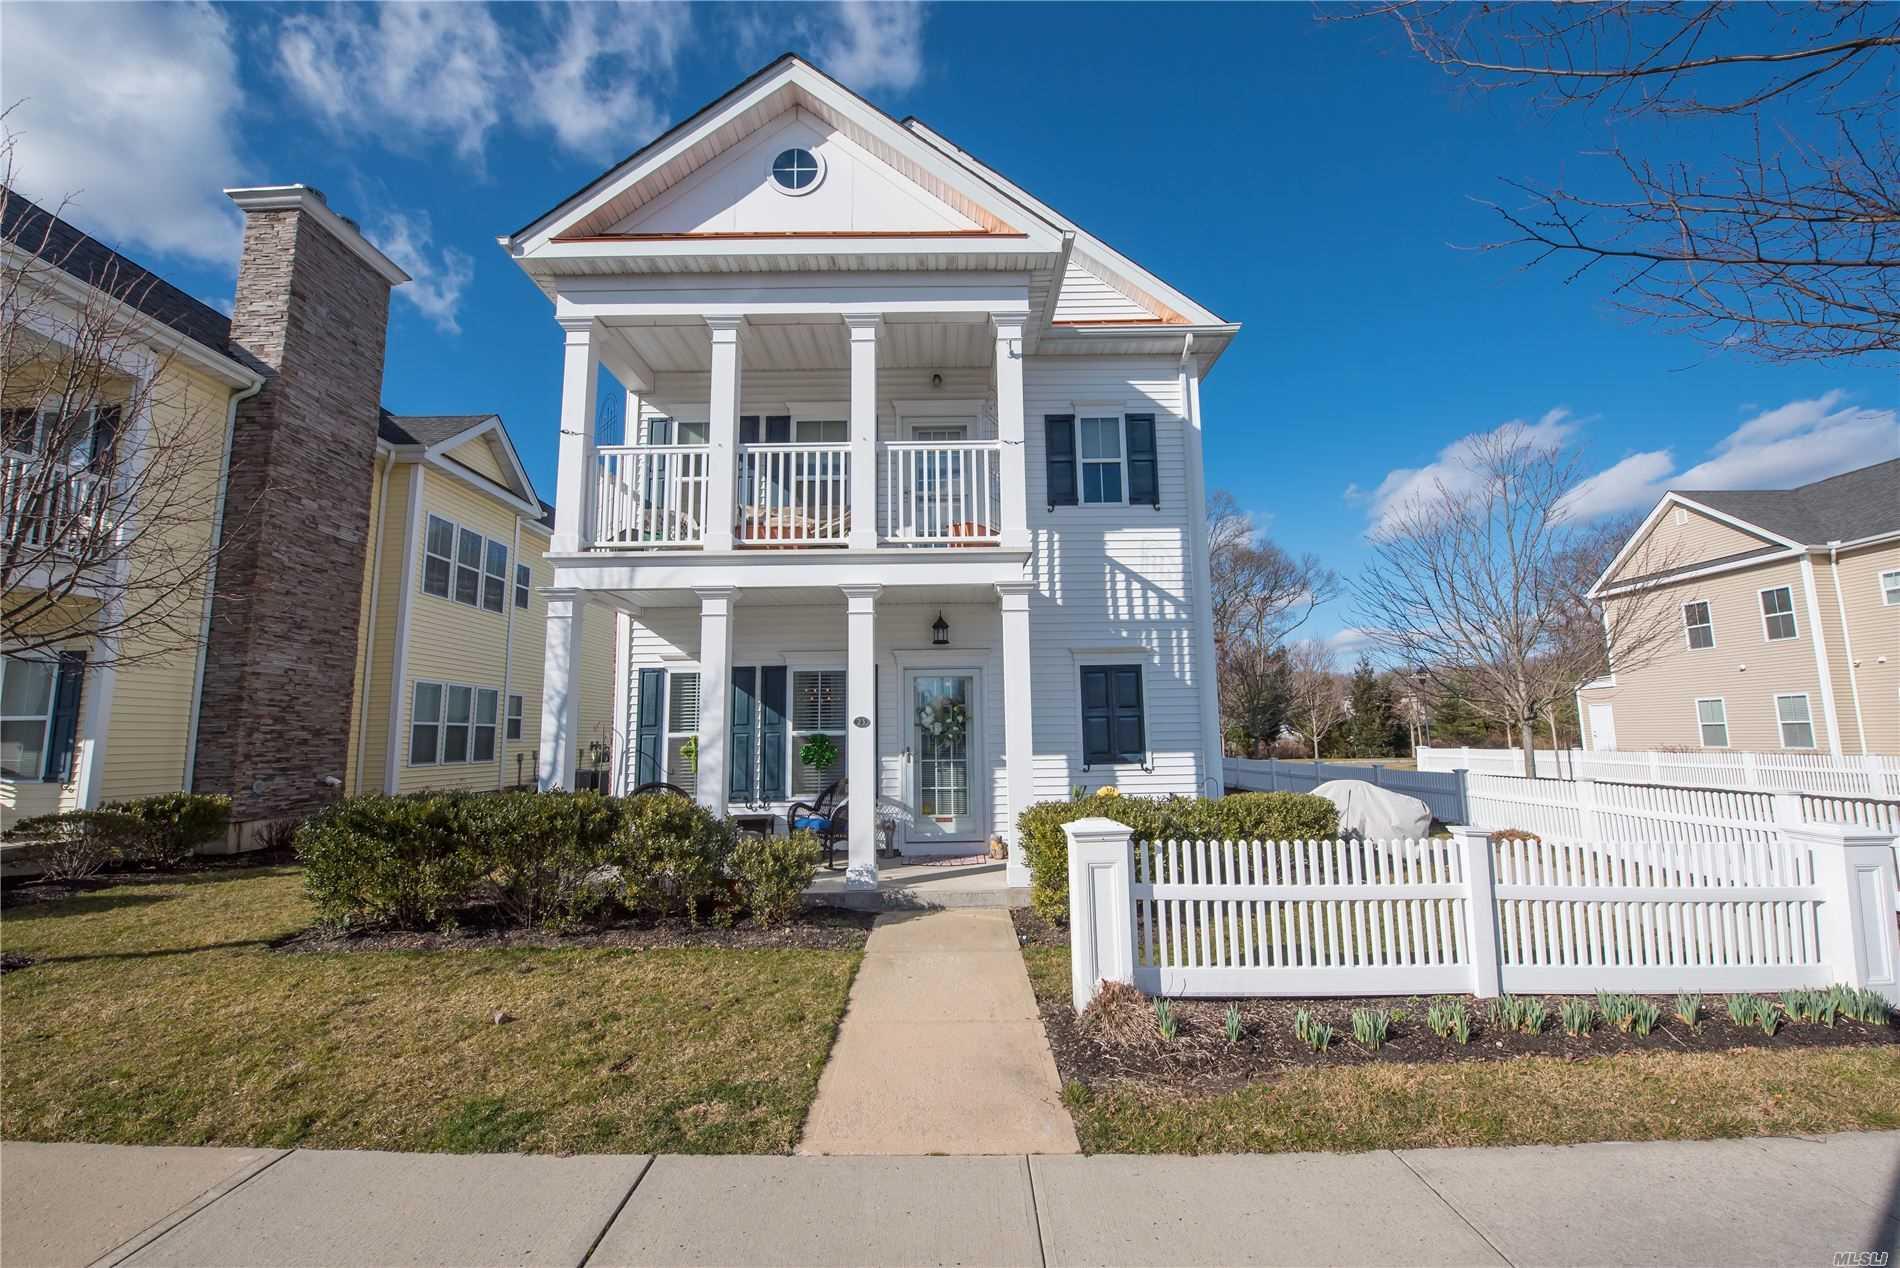 Property for sale at 23 Providence Drive, Islip Terrace NY 11752, Islip Terrace,  New York 11752